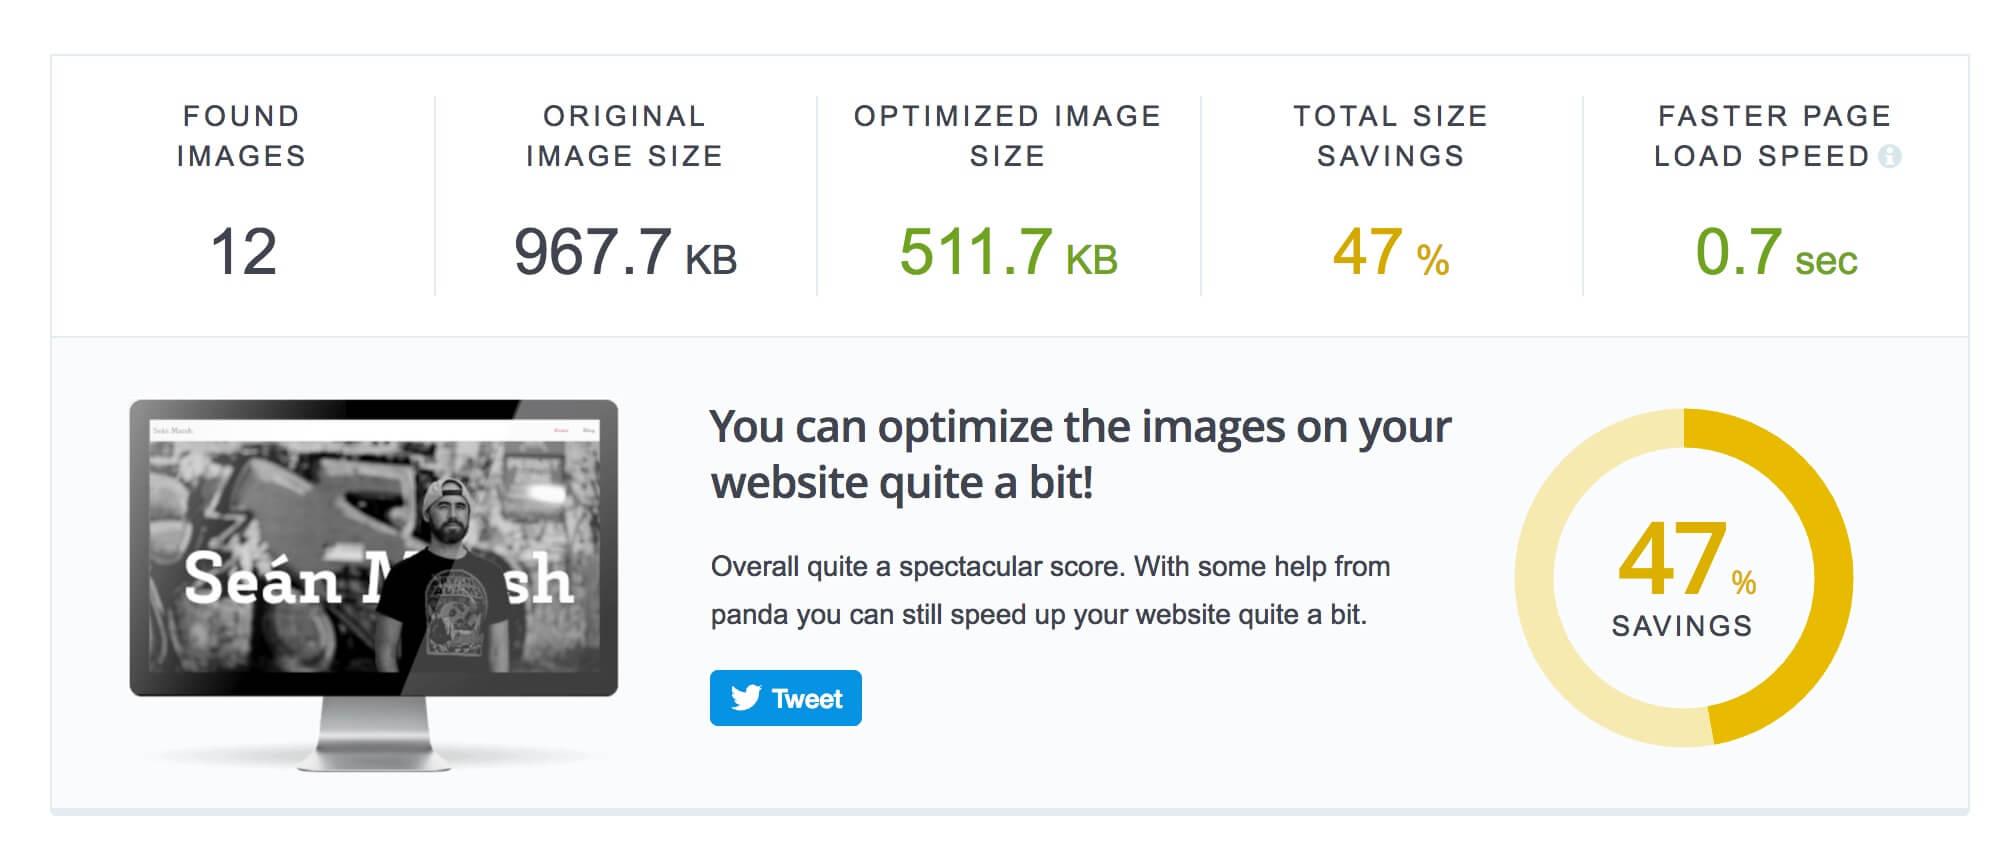 TinyPNG website optimisation analyser tool